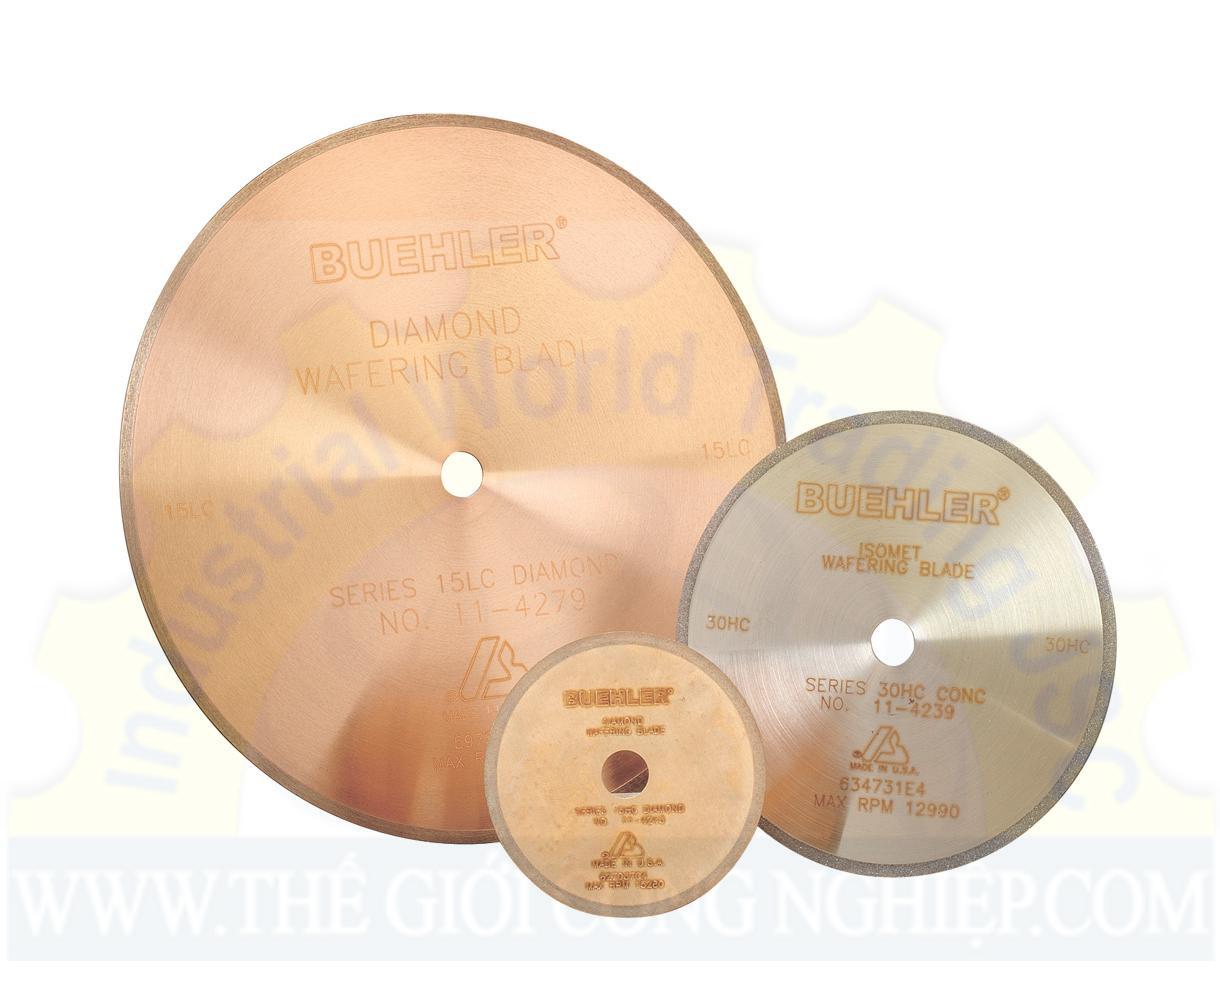 Diamond Wafering Blades ½″ (12.7mm) Arbor 15HC (No.11-4245) Buehler